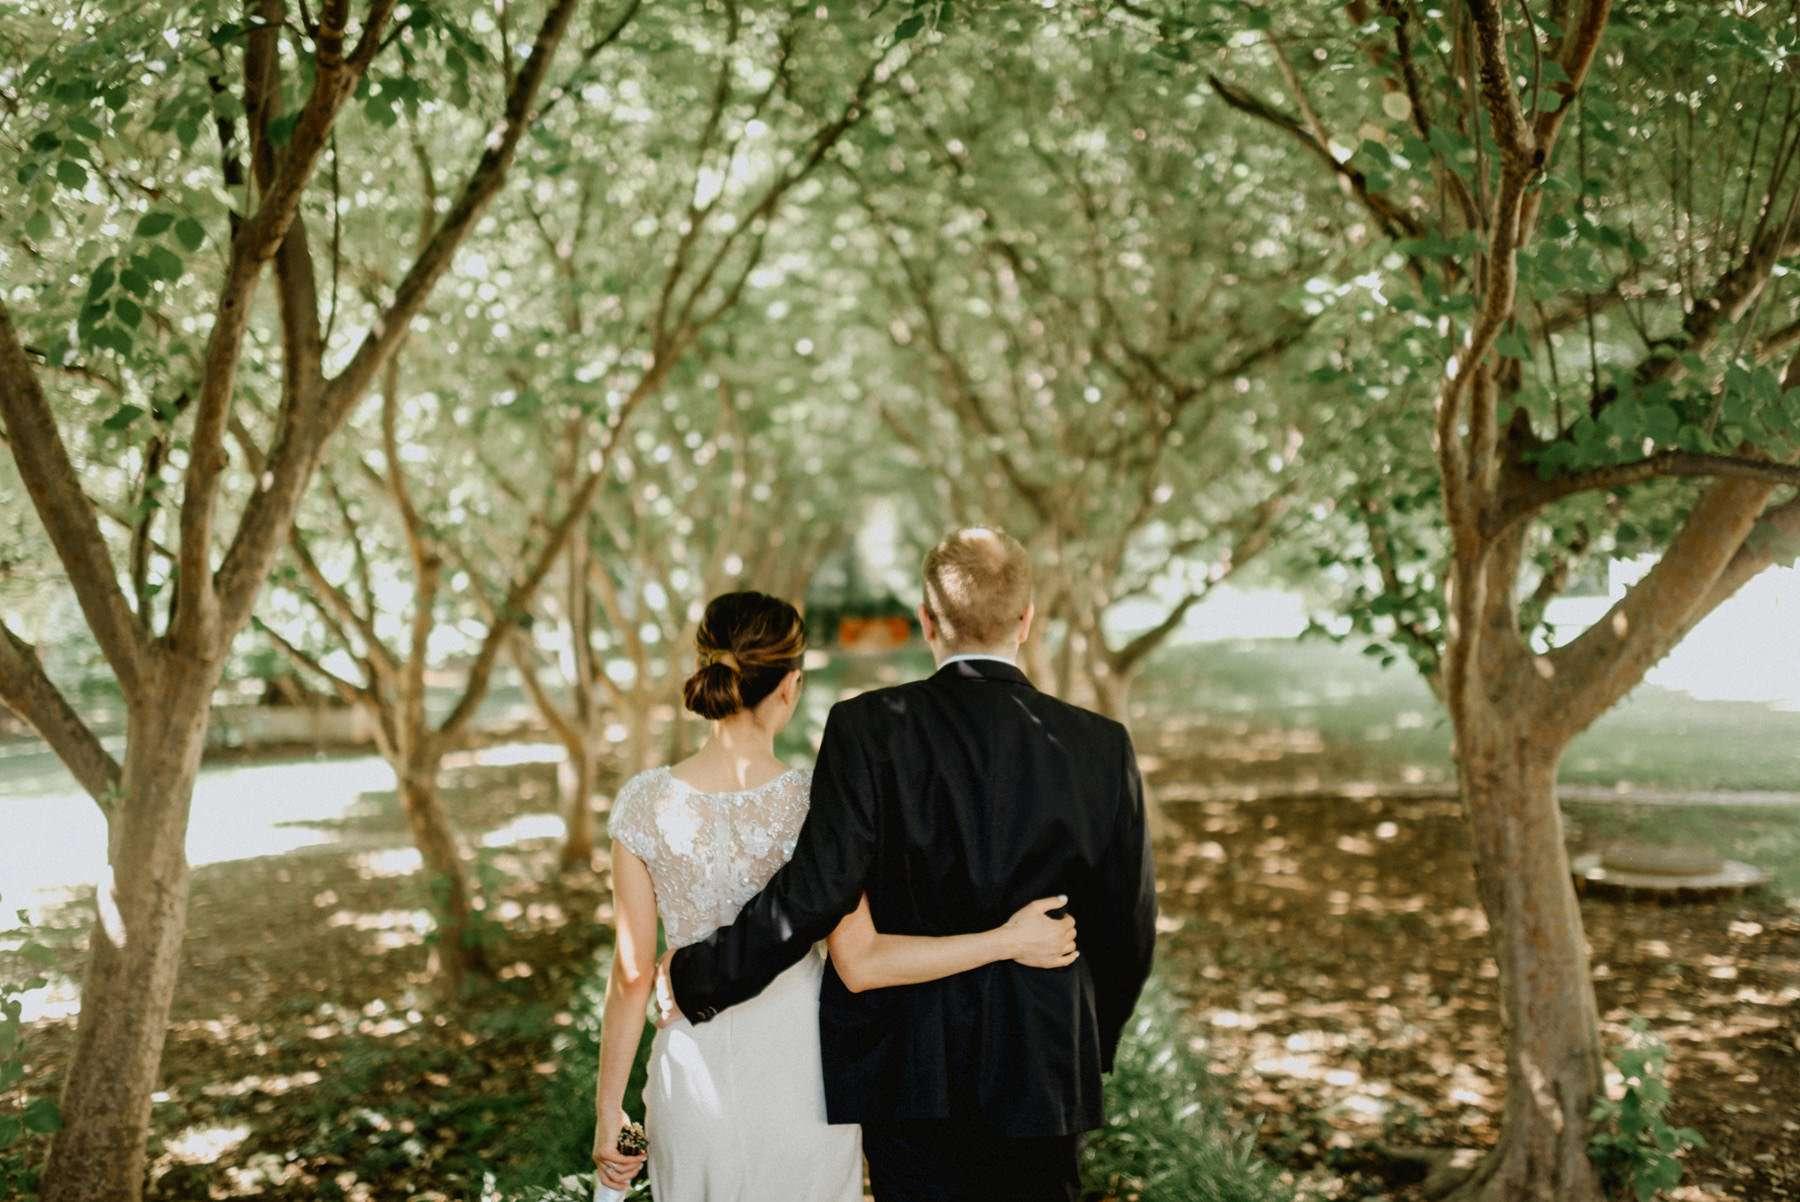 Appleford-estate-wedding-61.jpg